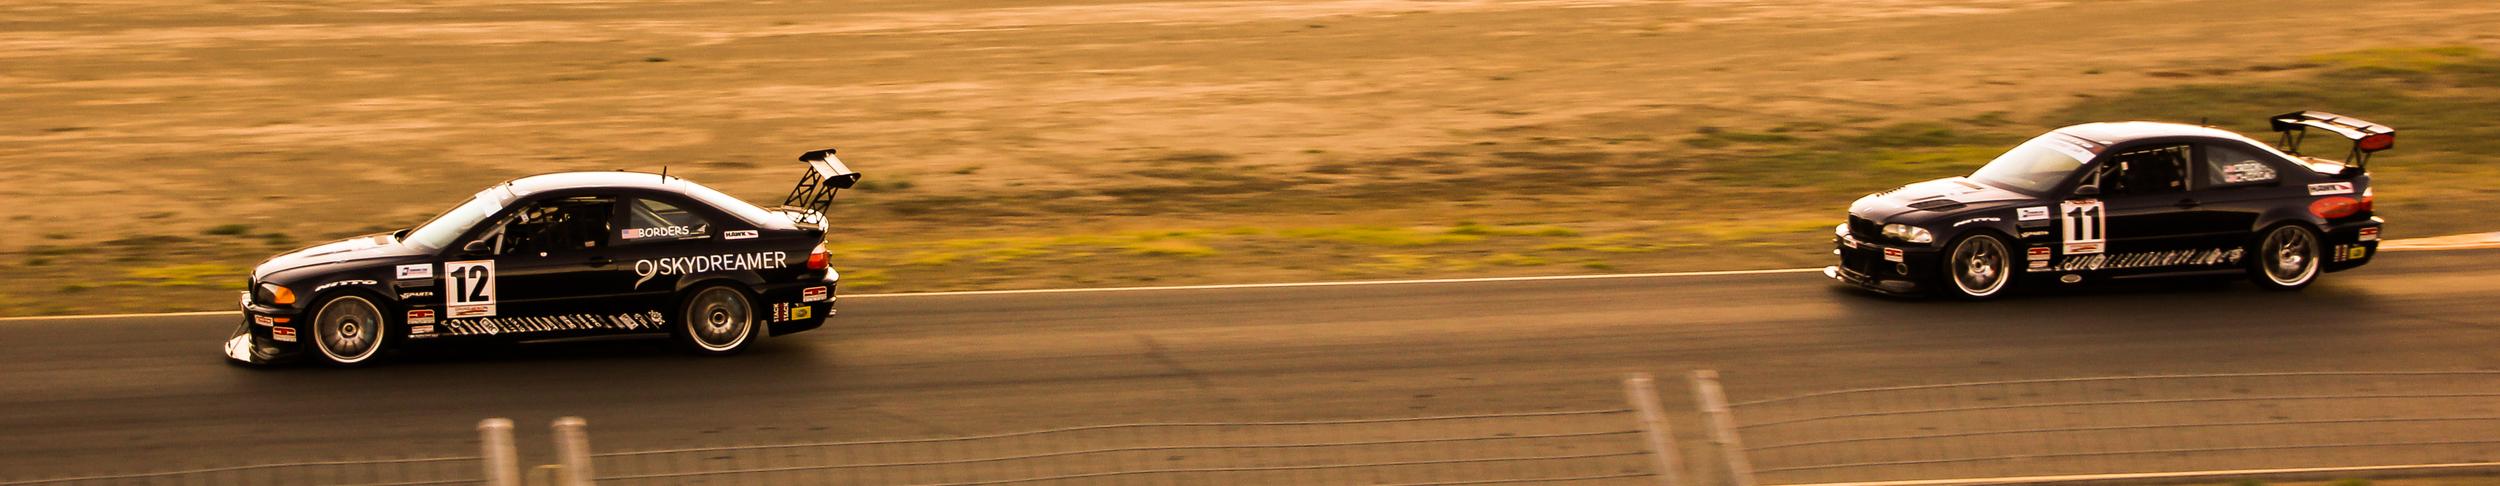 2015-10_RACE_Sonoma_USTCC_Cedric_3741.jpg